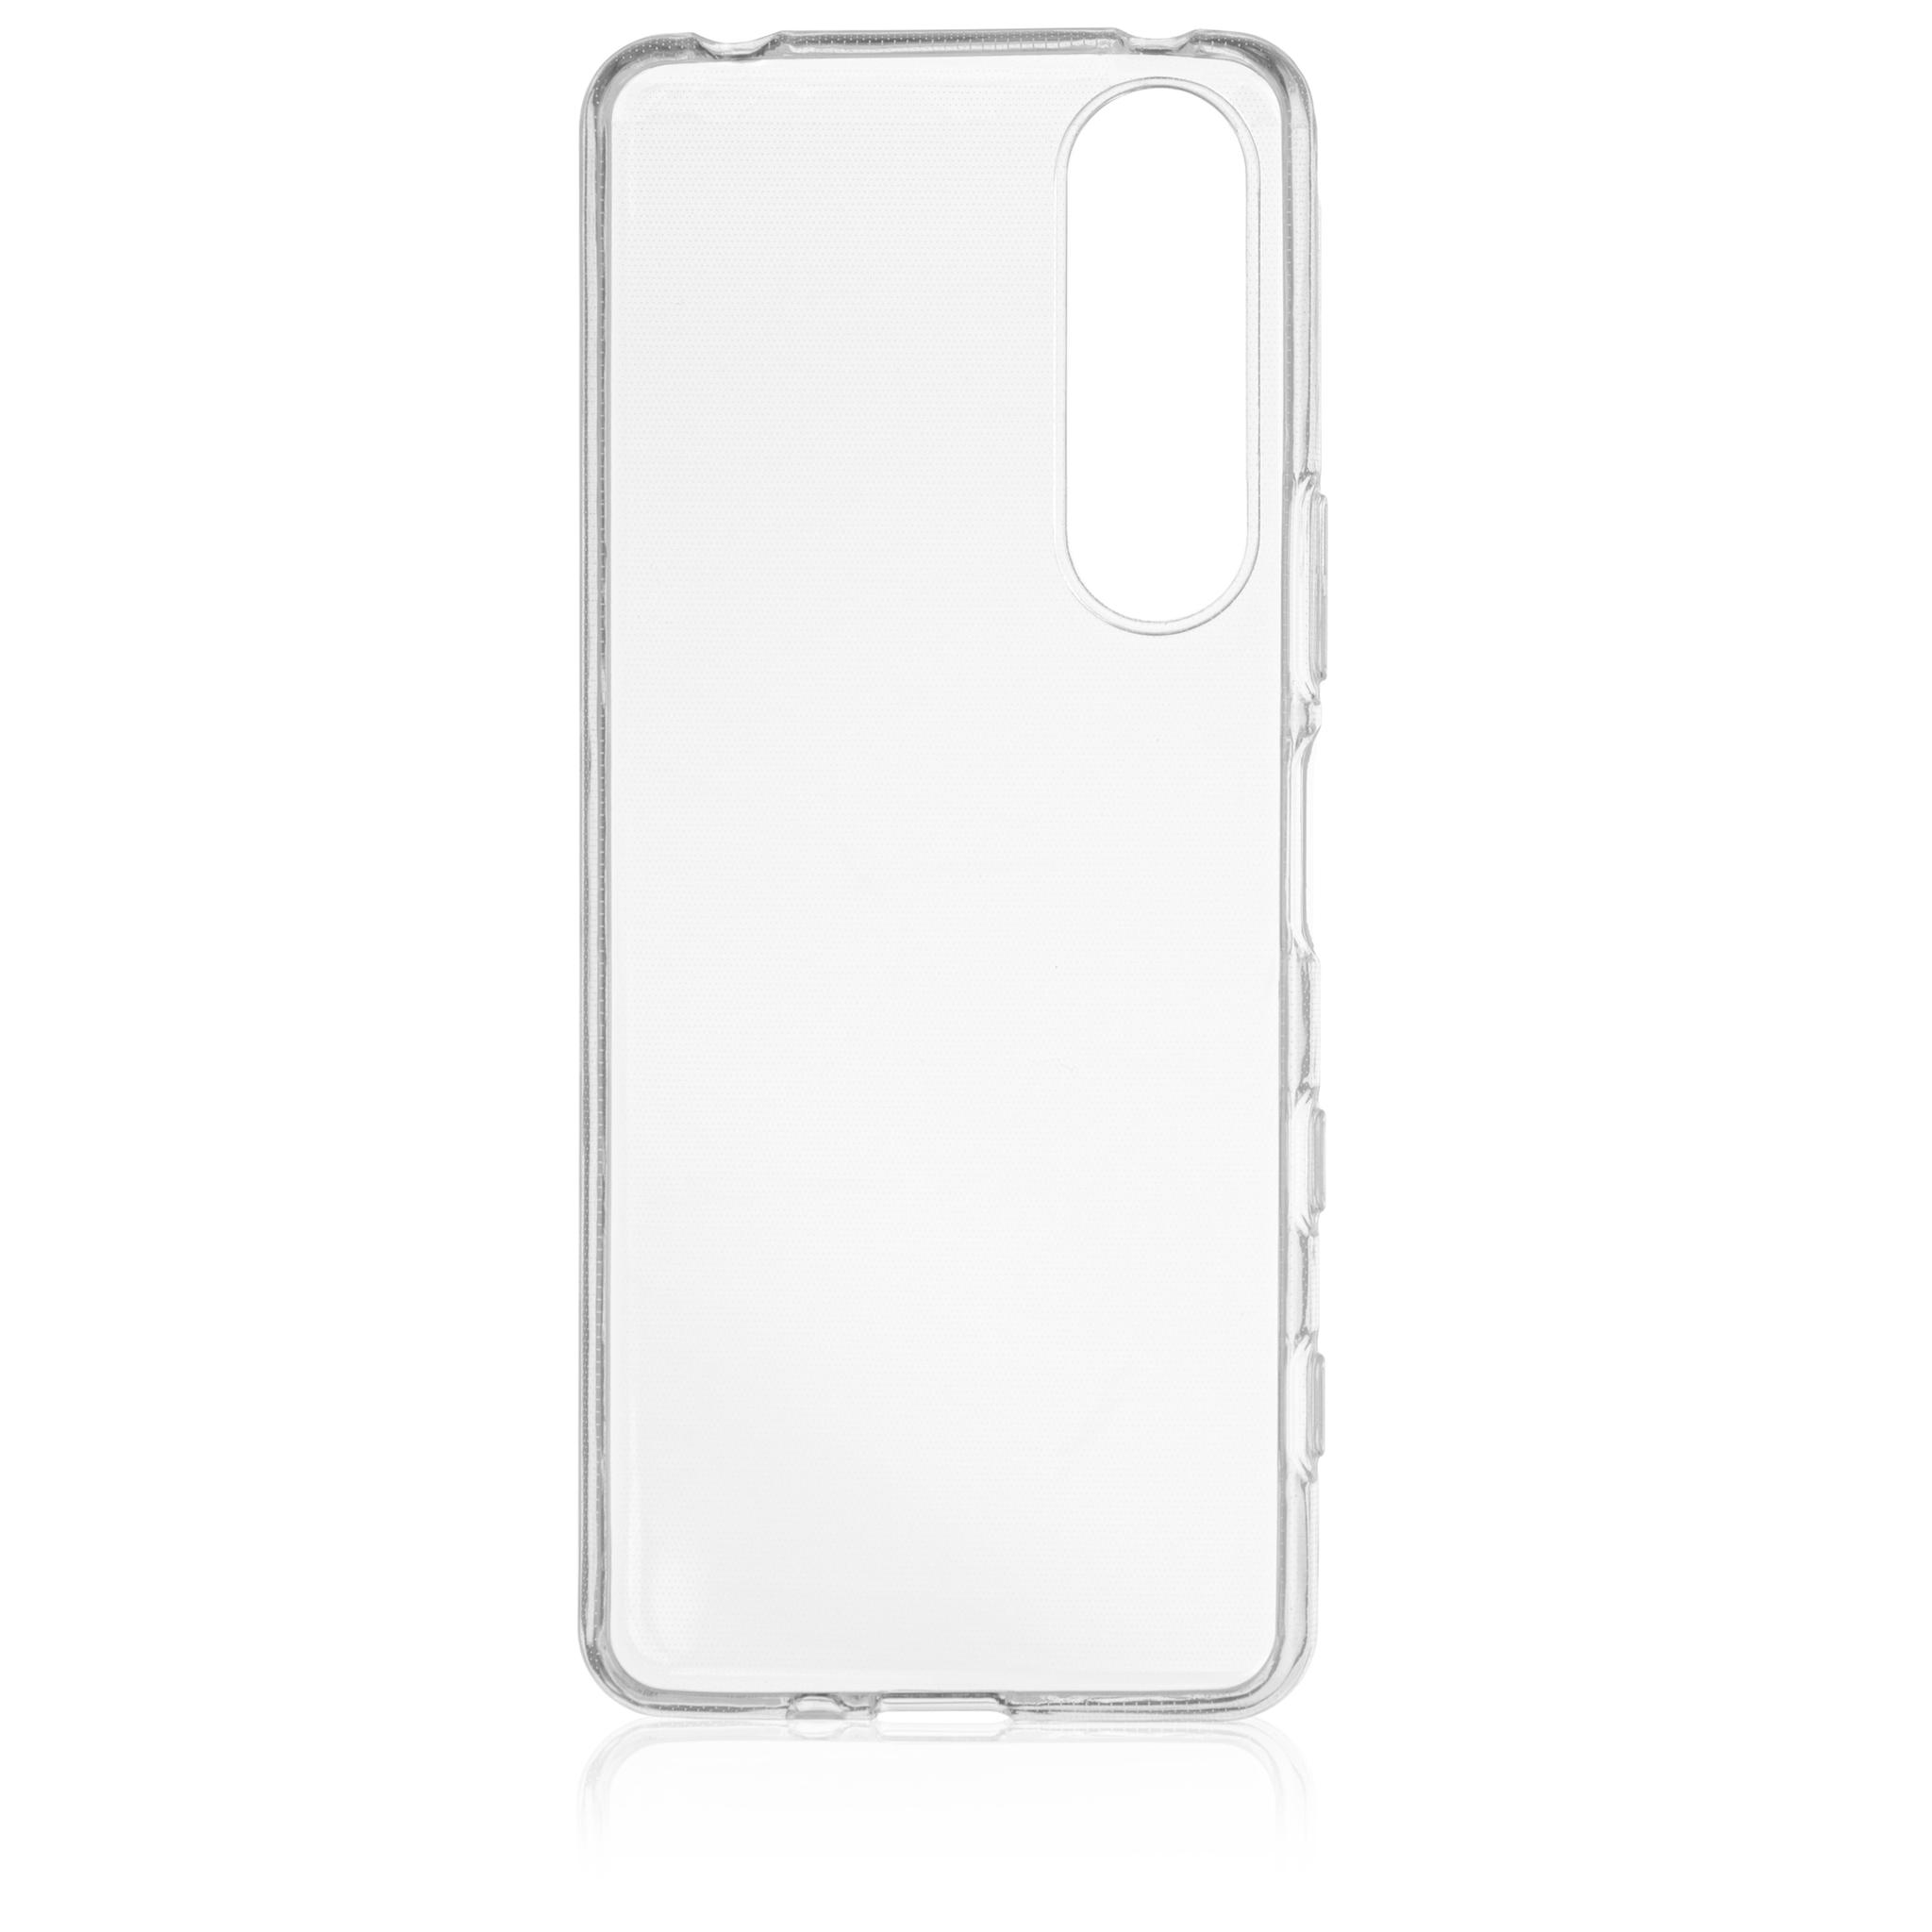 Brosco XPERIA 5 III / Накладка силиконовая прозрачная